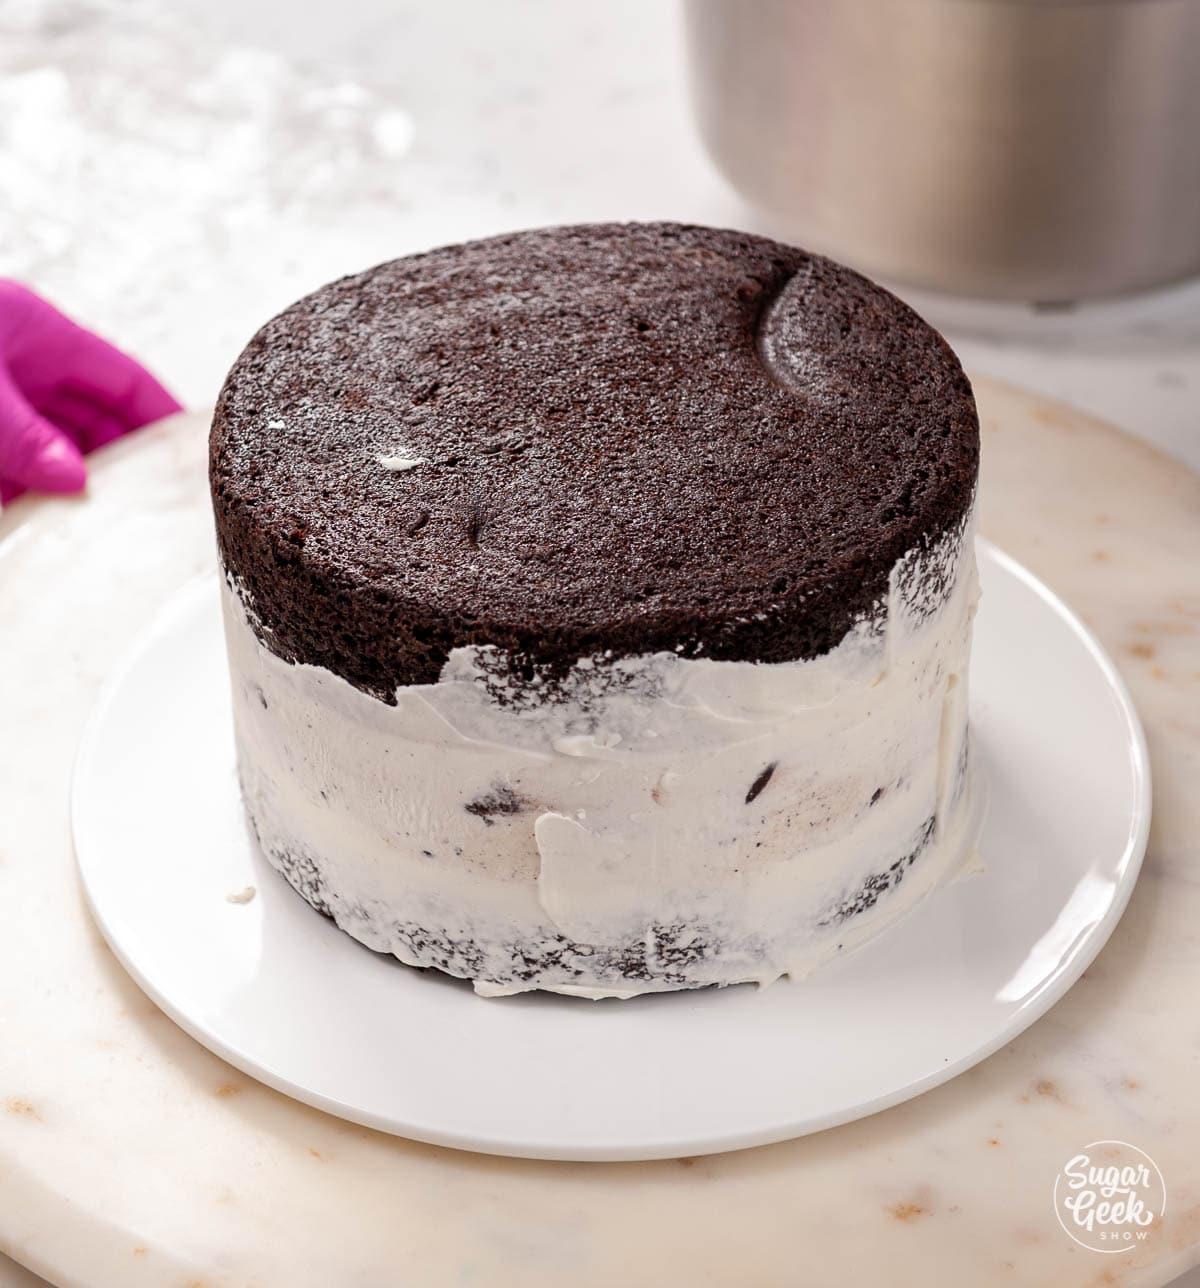 thin layer of whipped cream on ice cream cake